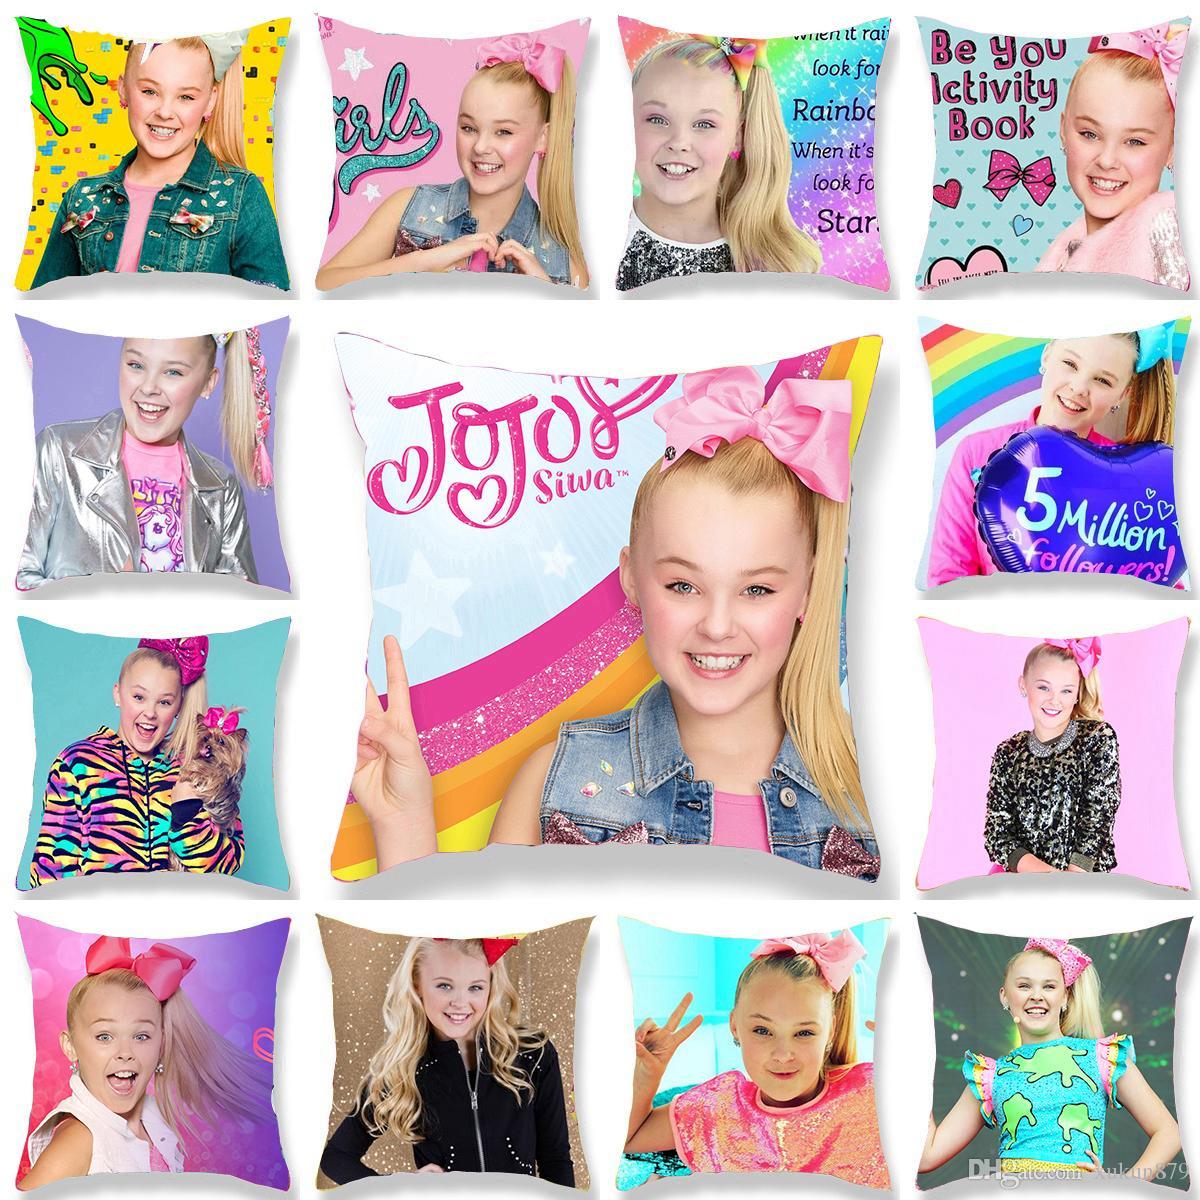 The Little Cute Girl Jojo Siwa JOJO SIWA Happy Pink Girl Printed Polyester Throw Pillow Cover Sofa Home Decor Pillowcase